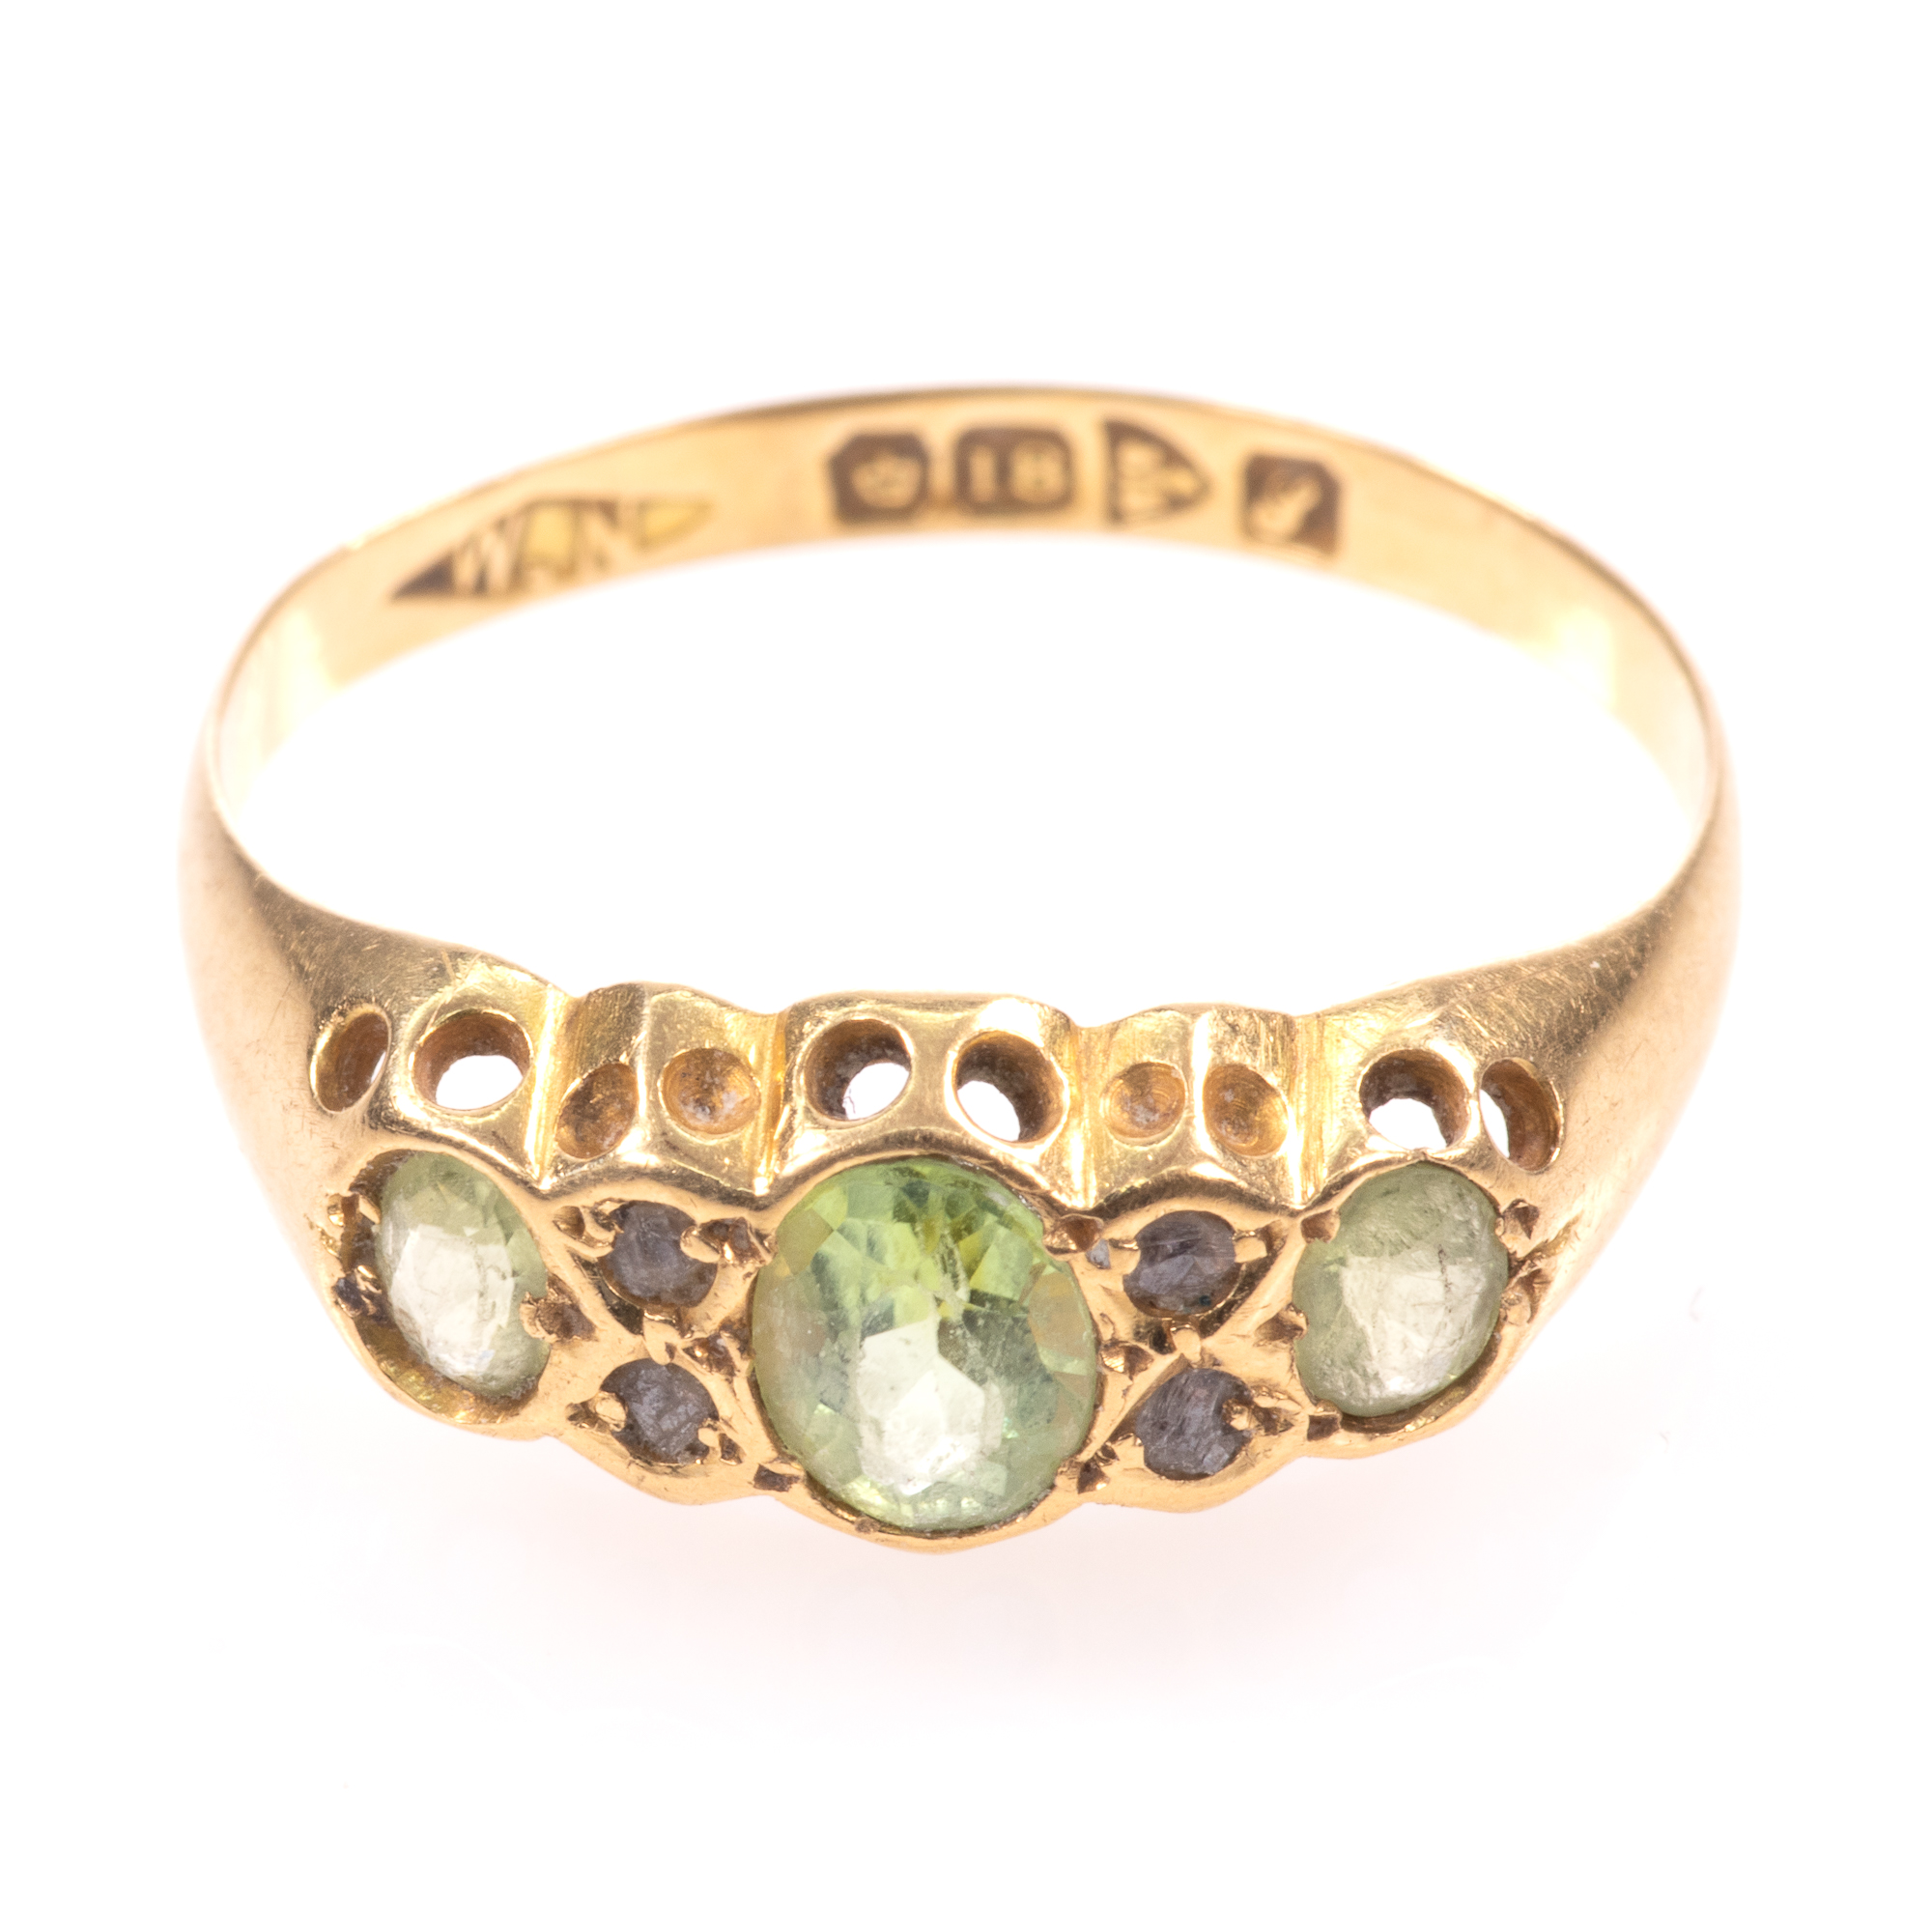 18ct Gold 0.90ct Peridot & Diamond Ring Chester 1918 - Image 3 of 8